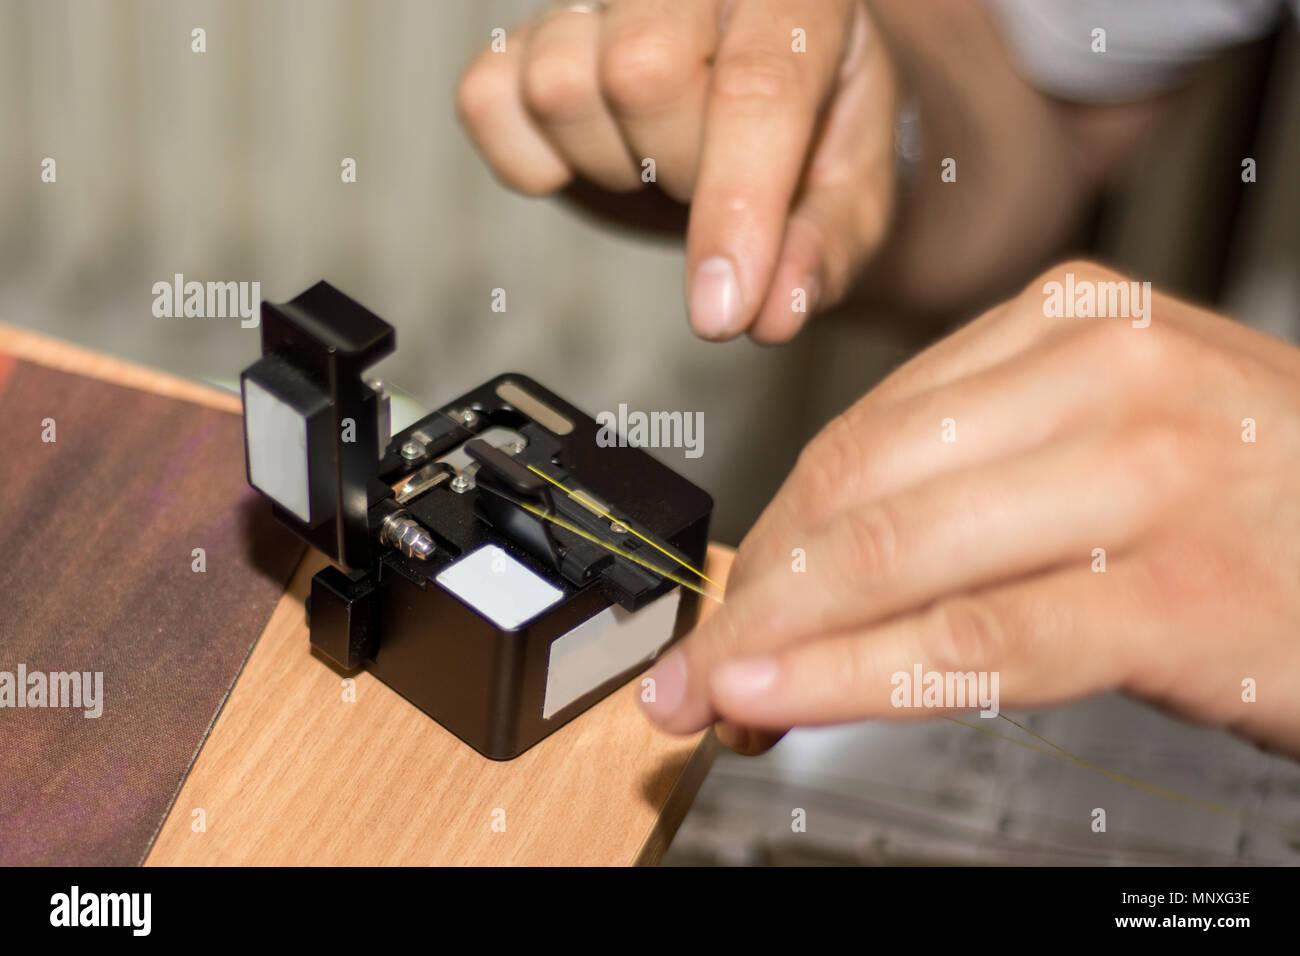 Fiber Optic Cables Stockfotos & Fiber Optic Cables Bilder - Alamy